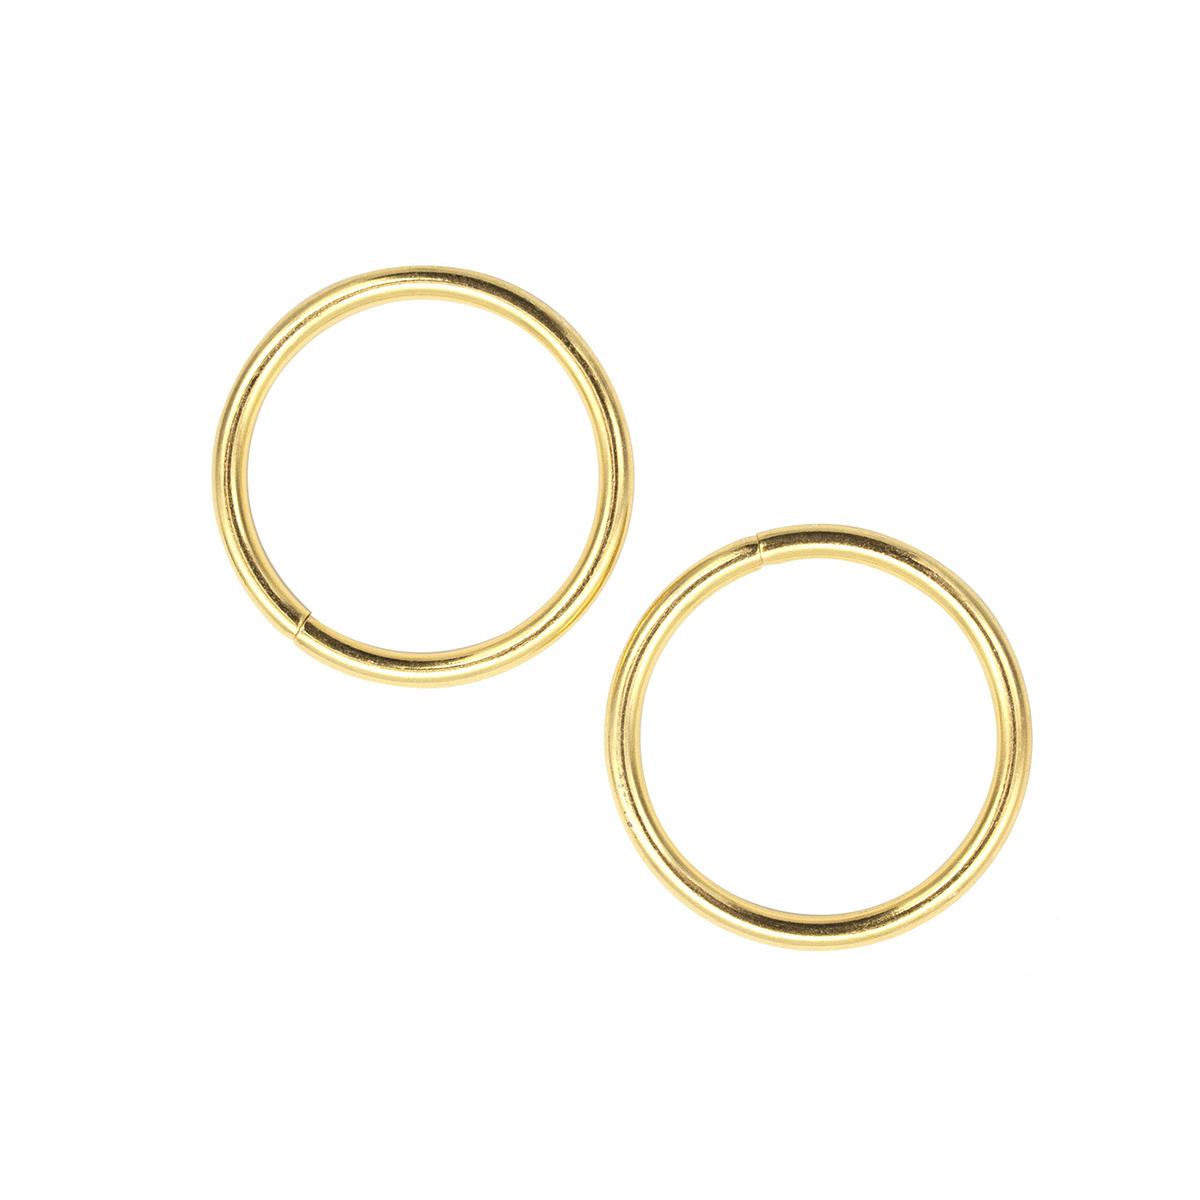 816-018 Кольцо разъемное 50*5,0 мм, упак./2 шт., Hobby&Pro